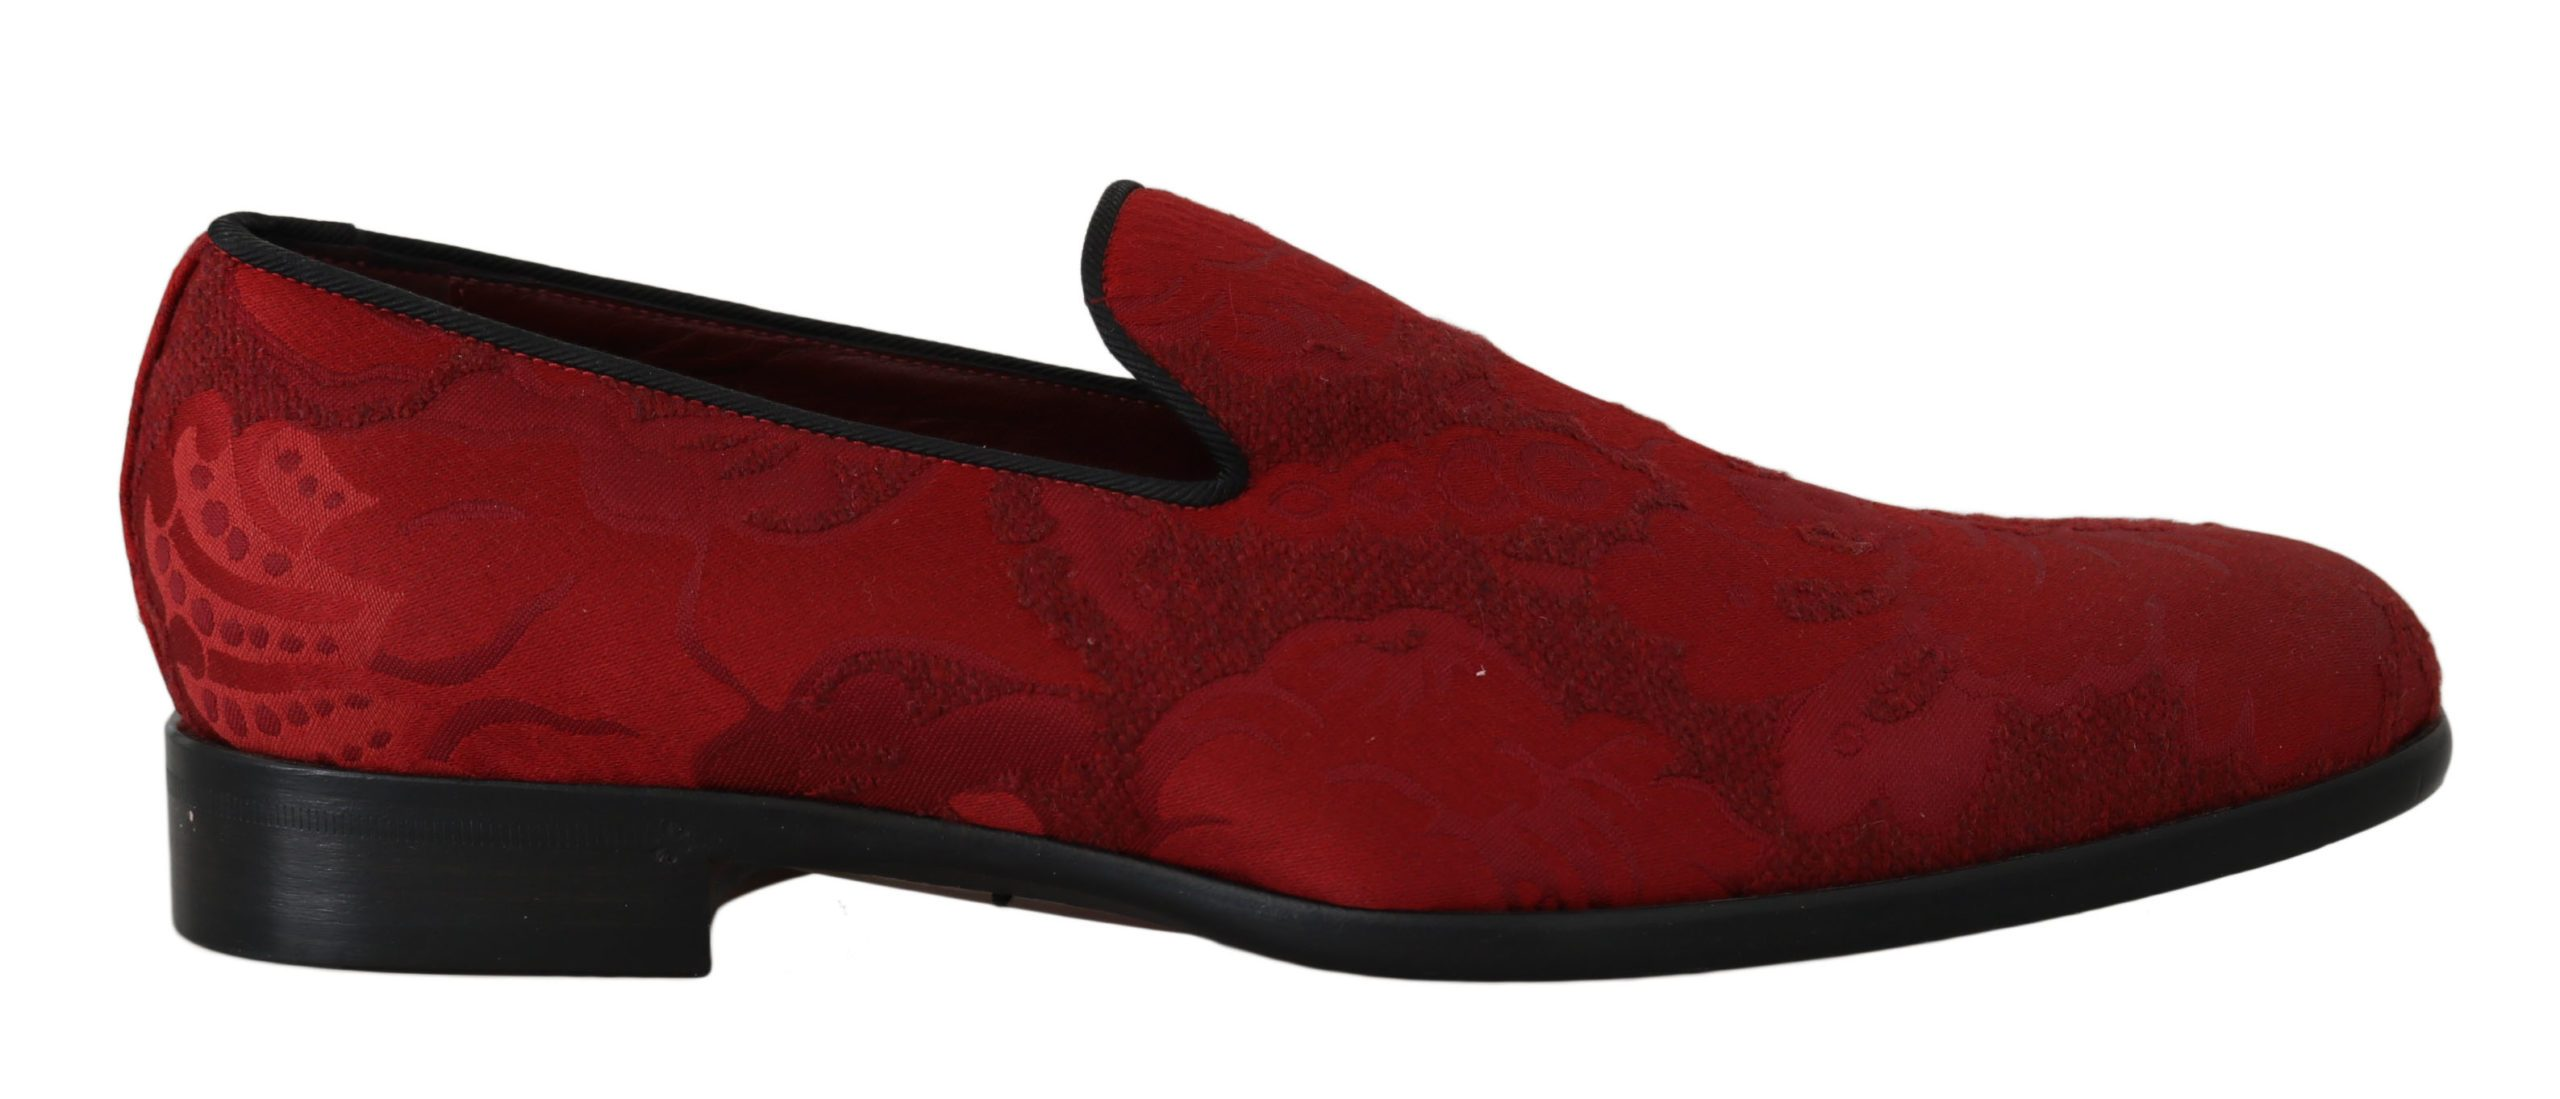 Dolce & Gabbana Men's Jacquard Loafers Dress Formal Shoes Red MV2266 - EU39/US6